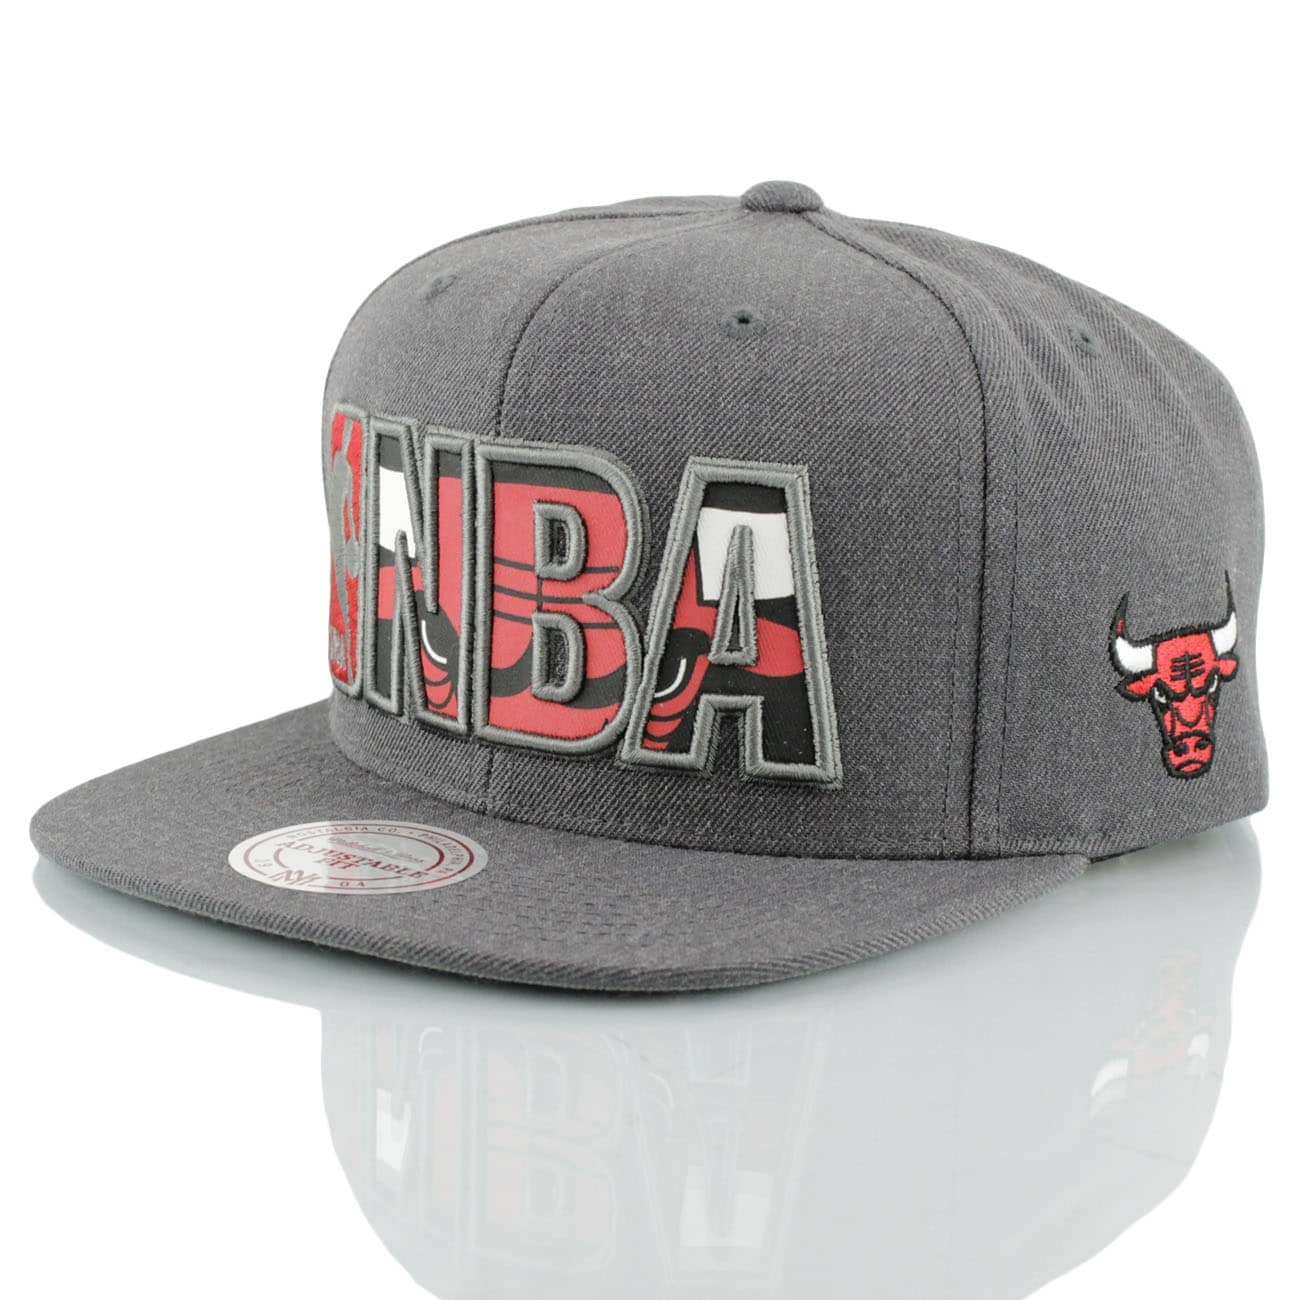 sports shoes c8c78 8f853 Mitchell   Ness Chicago Bulls Insider Reflective Snapback NBA Cap    TAASS.com Fan Shop